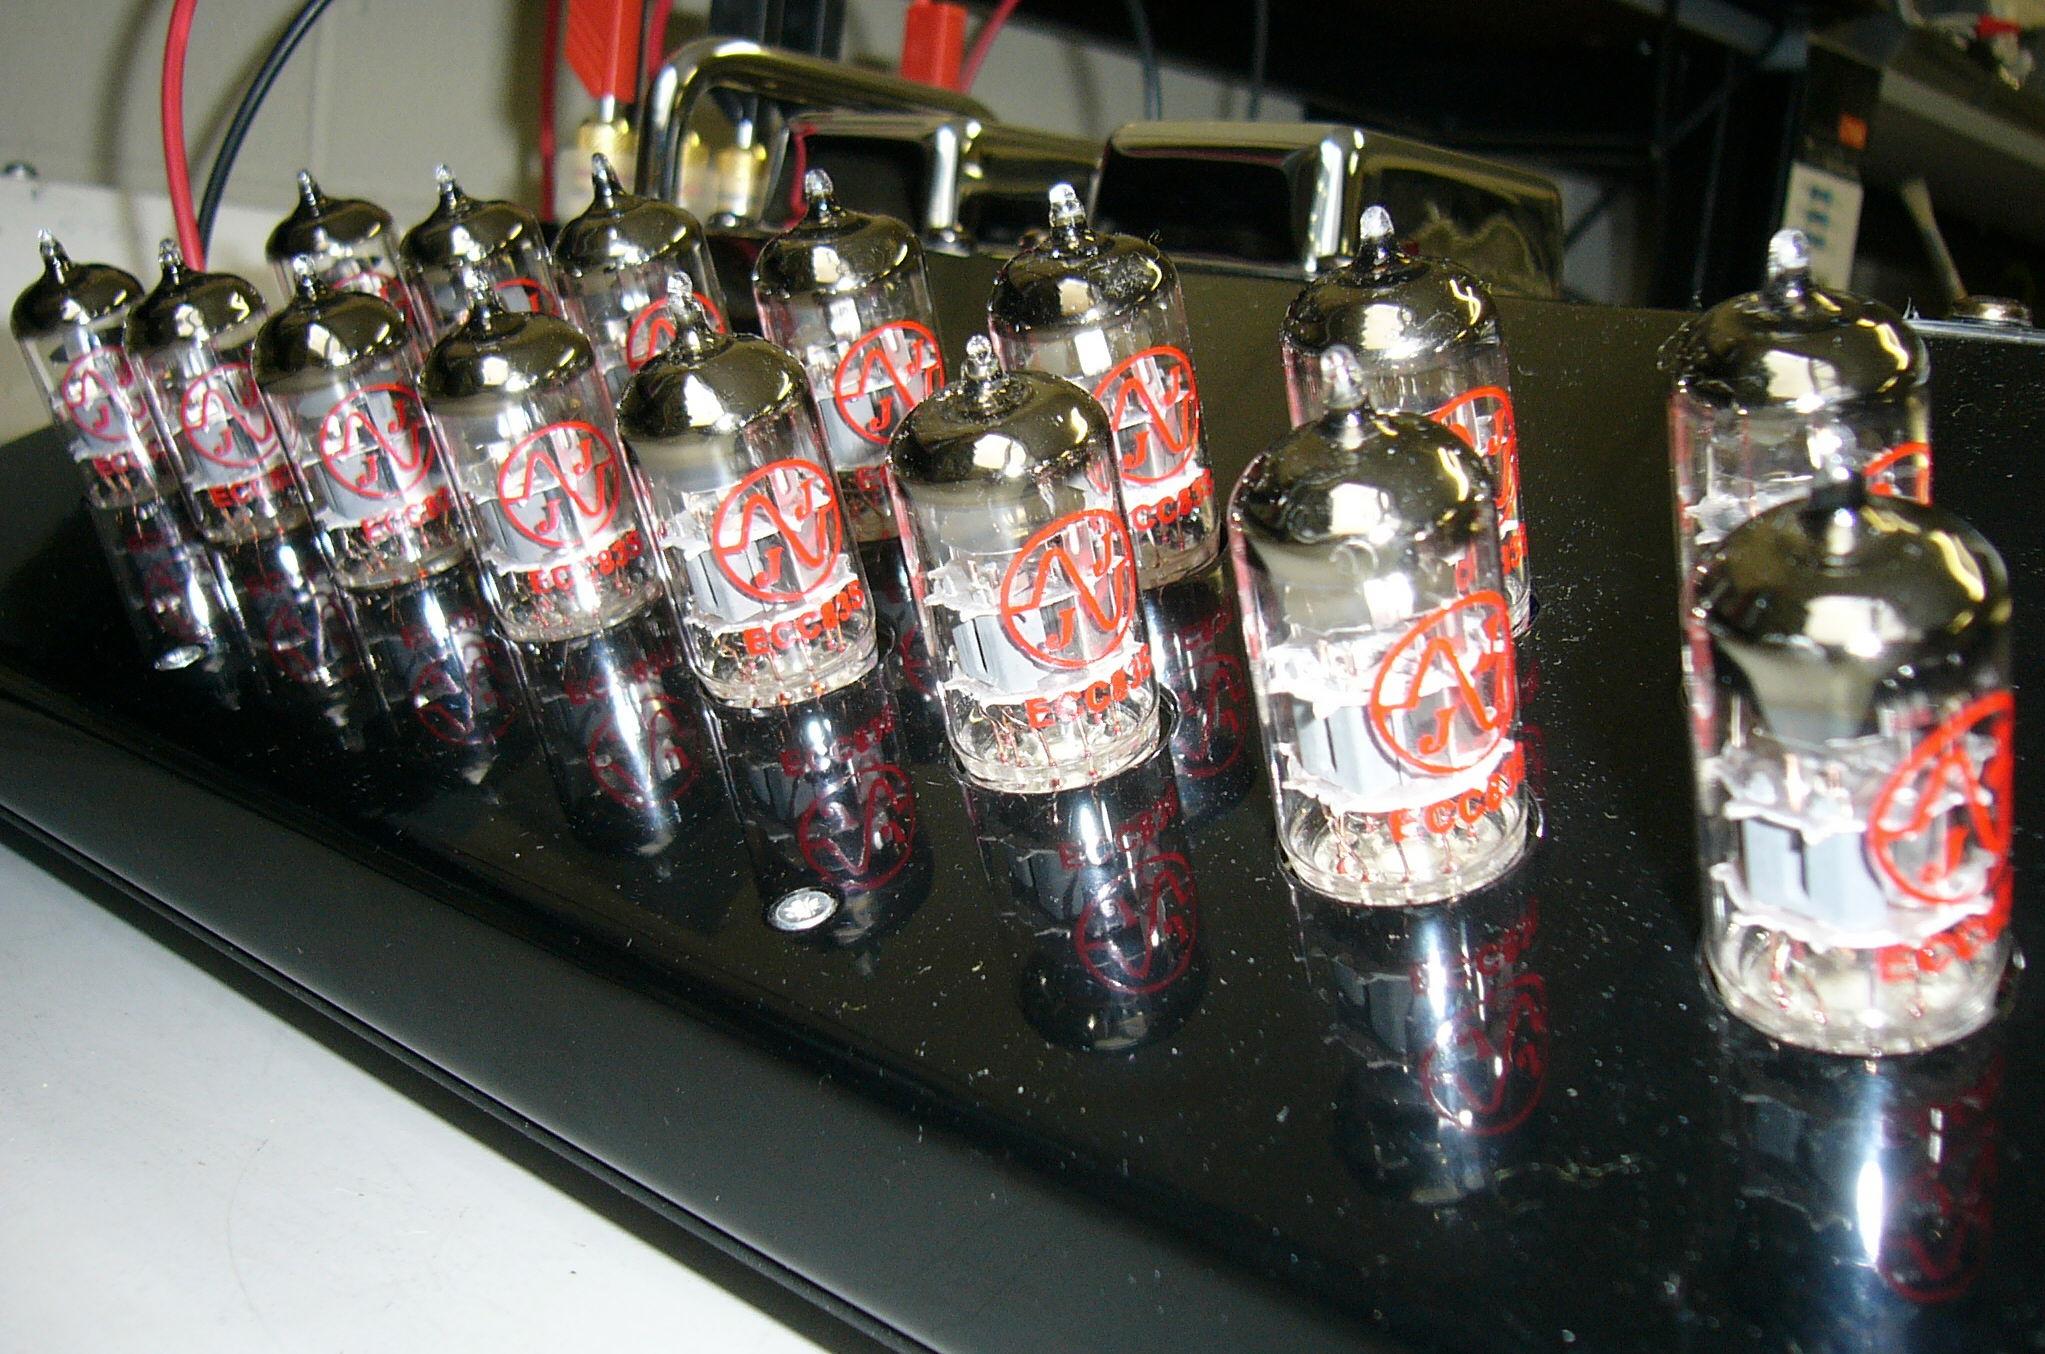 Valve amp service, repair, restoration